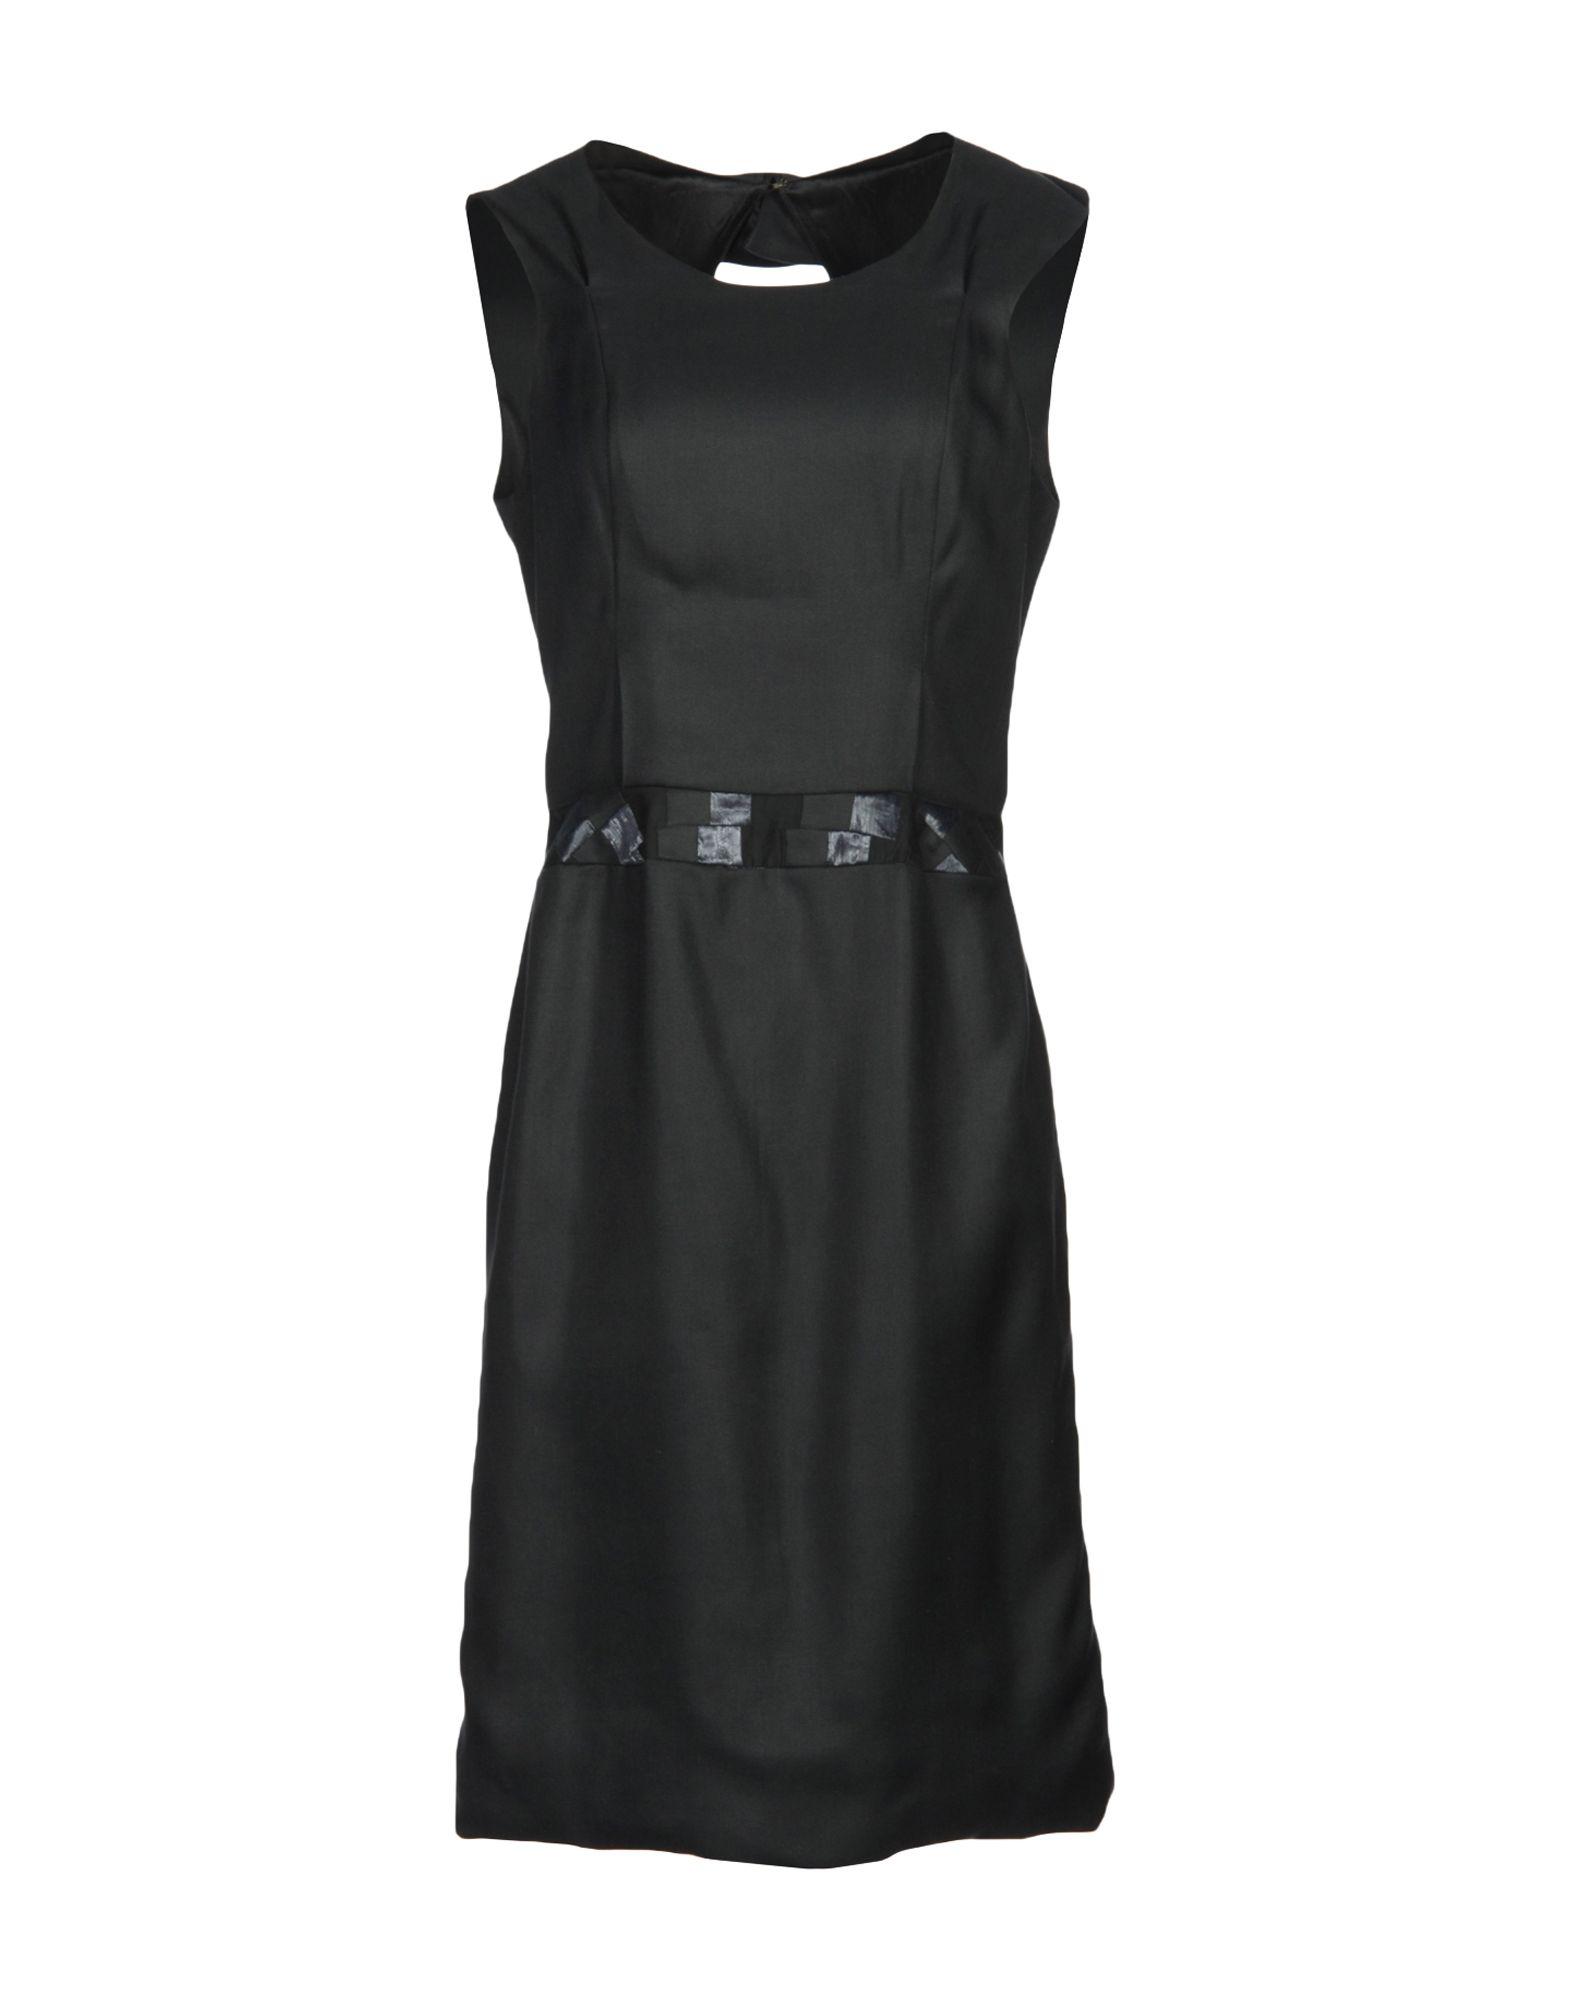 JASMIN SHOKRIAN Knee-Length Dress in Black